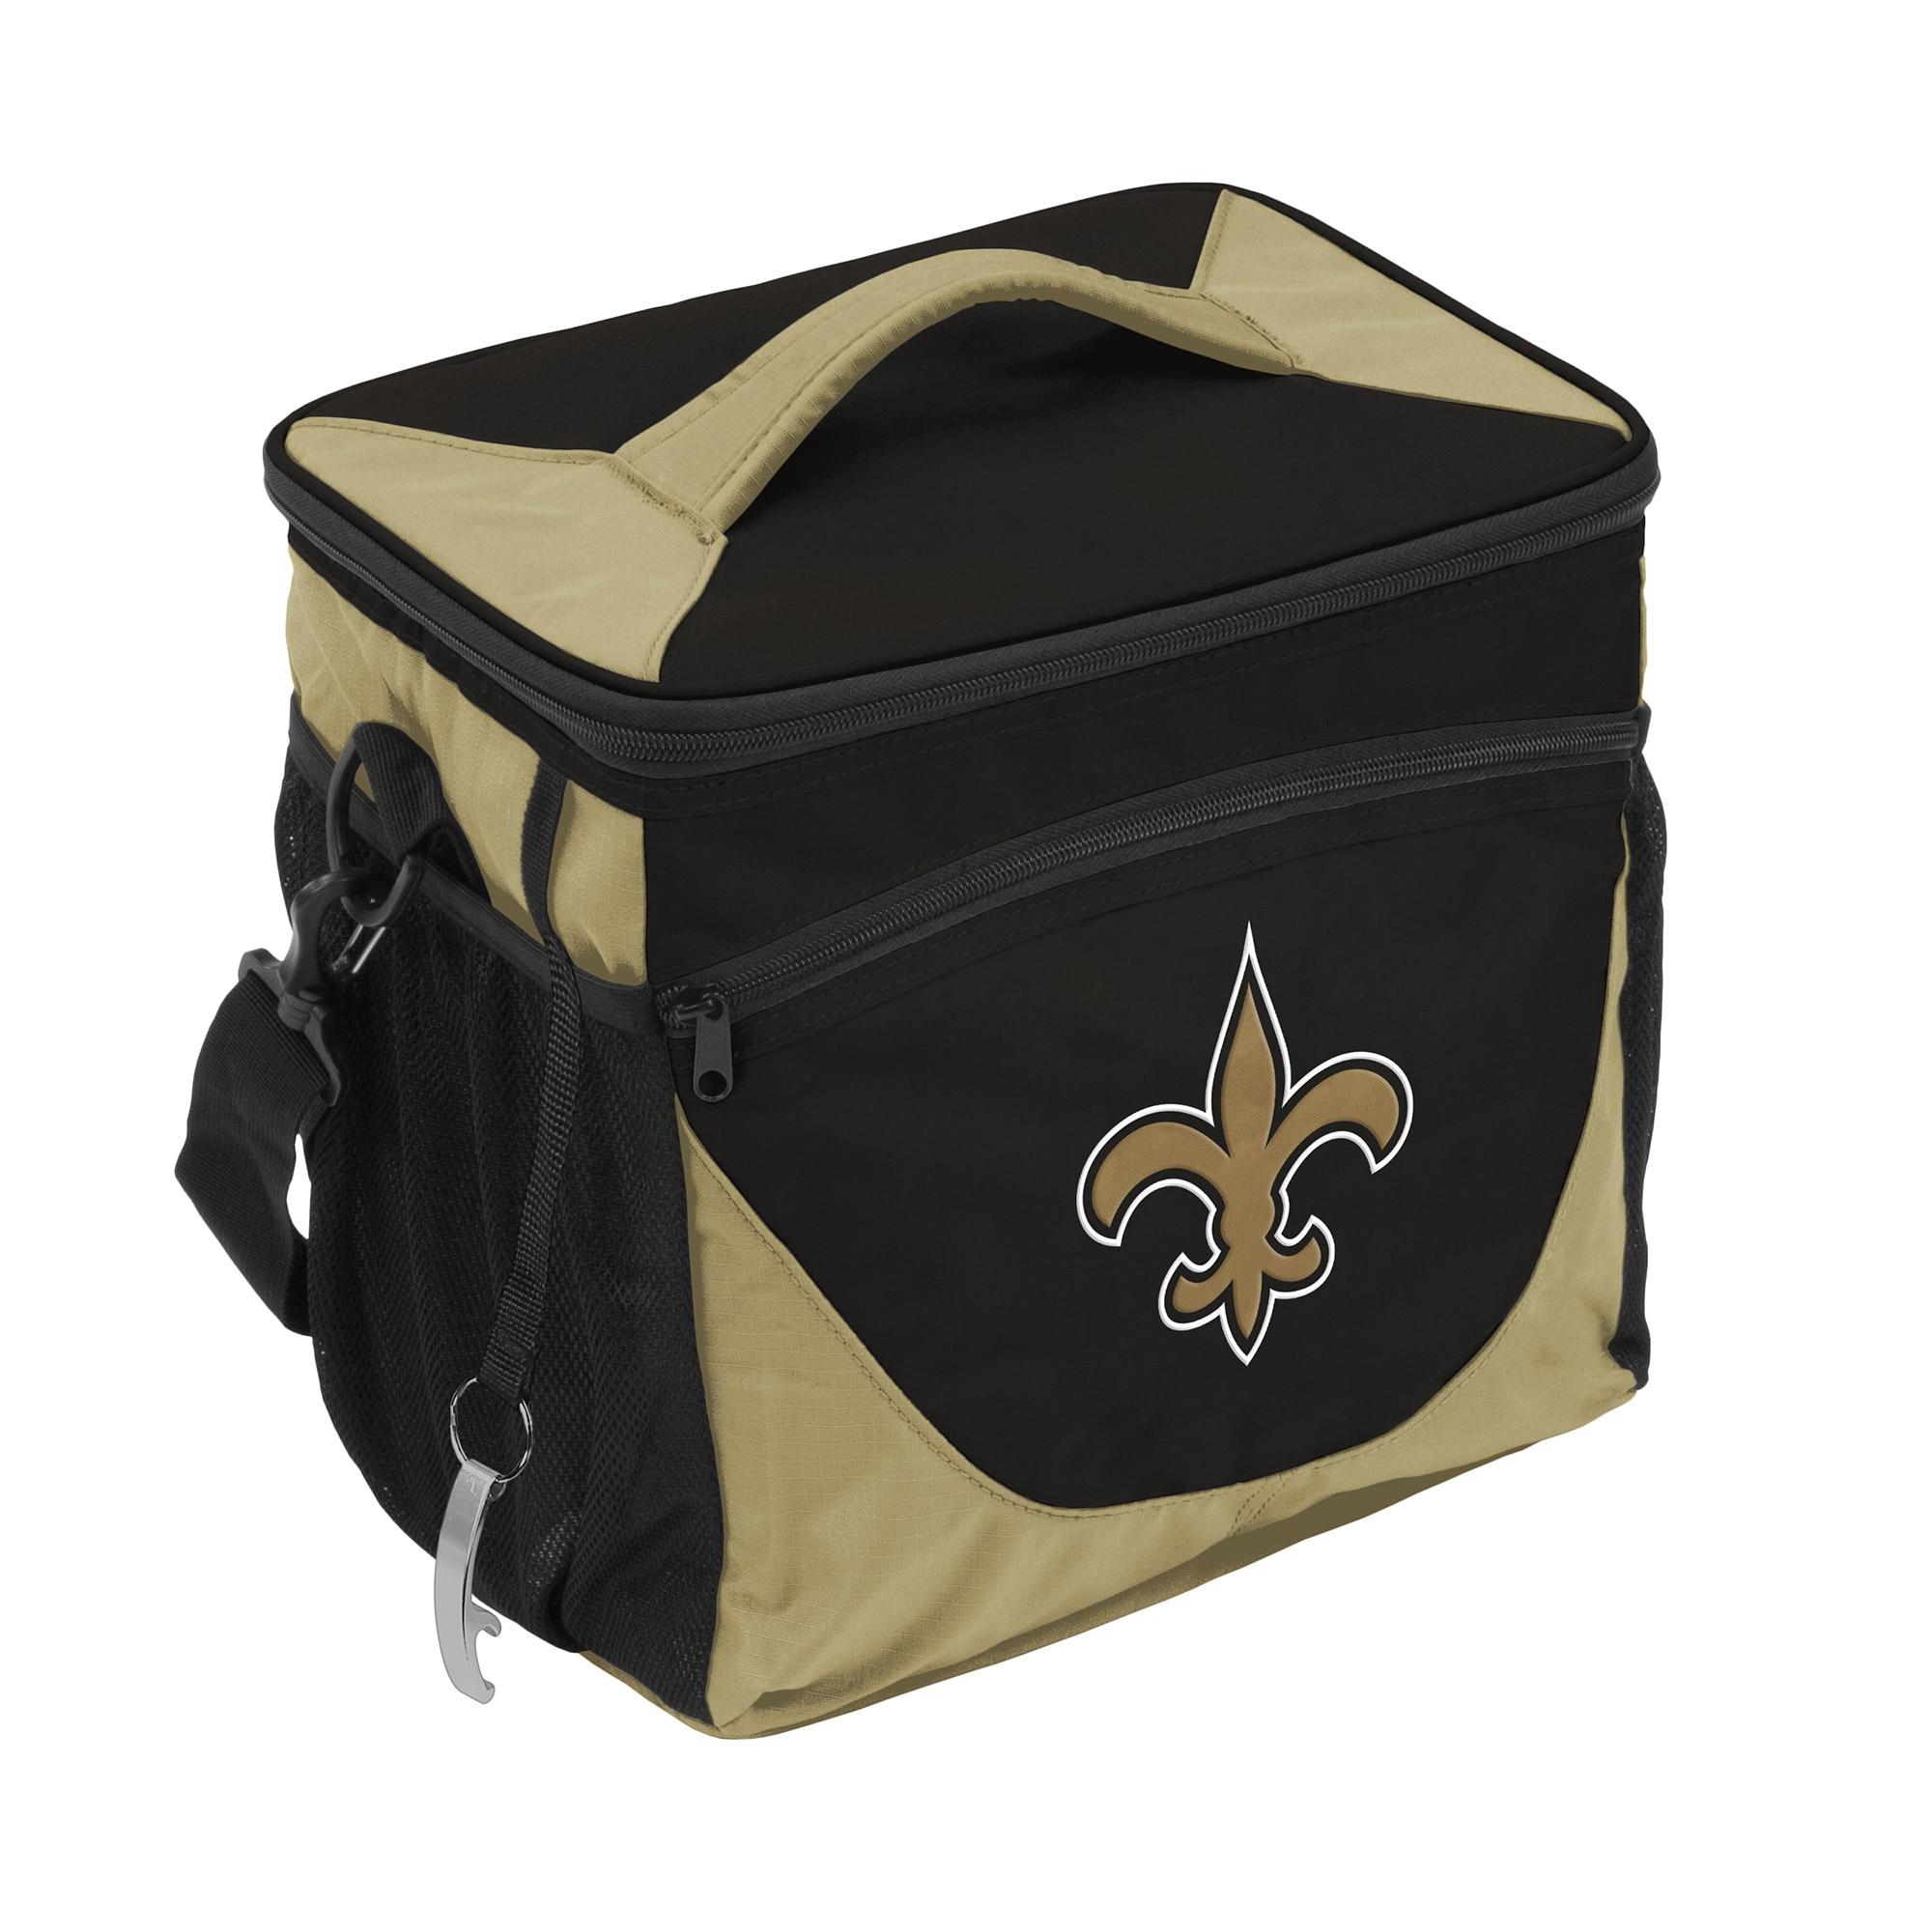 New Orleans Saints 24-Can Cooler